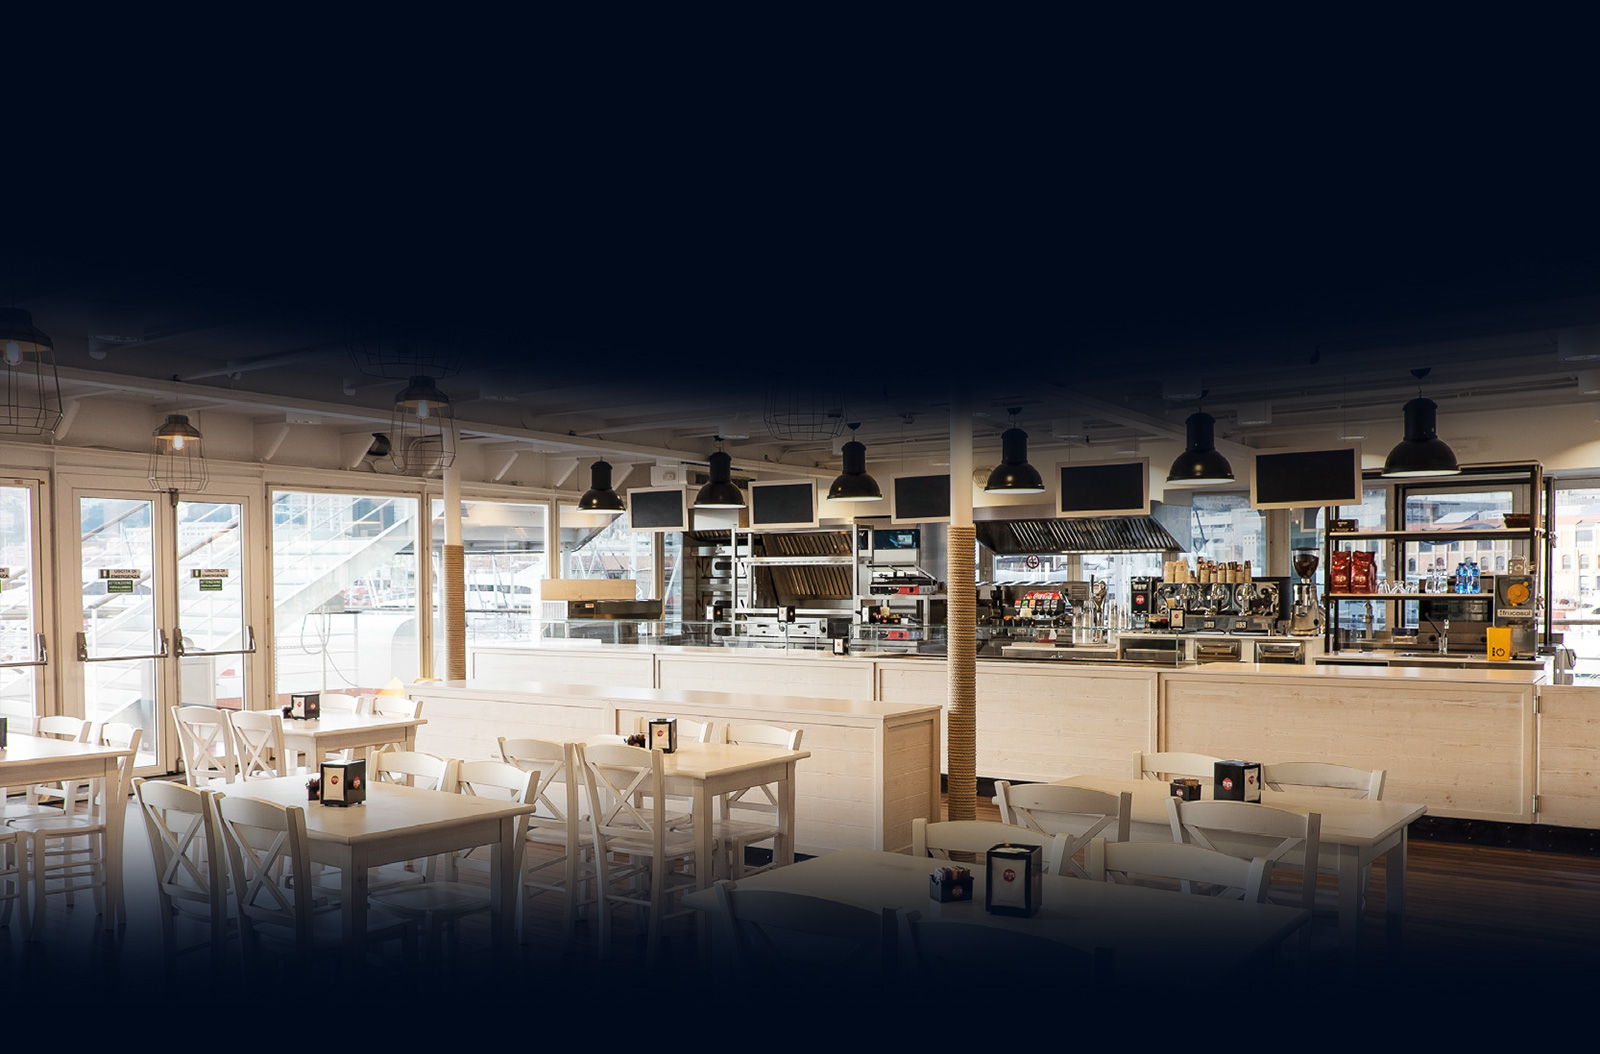 Acquario di Genova - new catering tender cafe